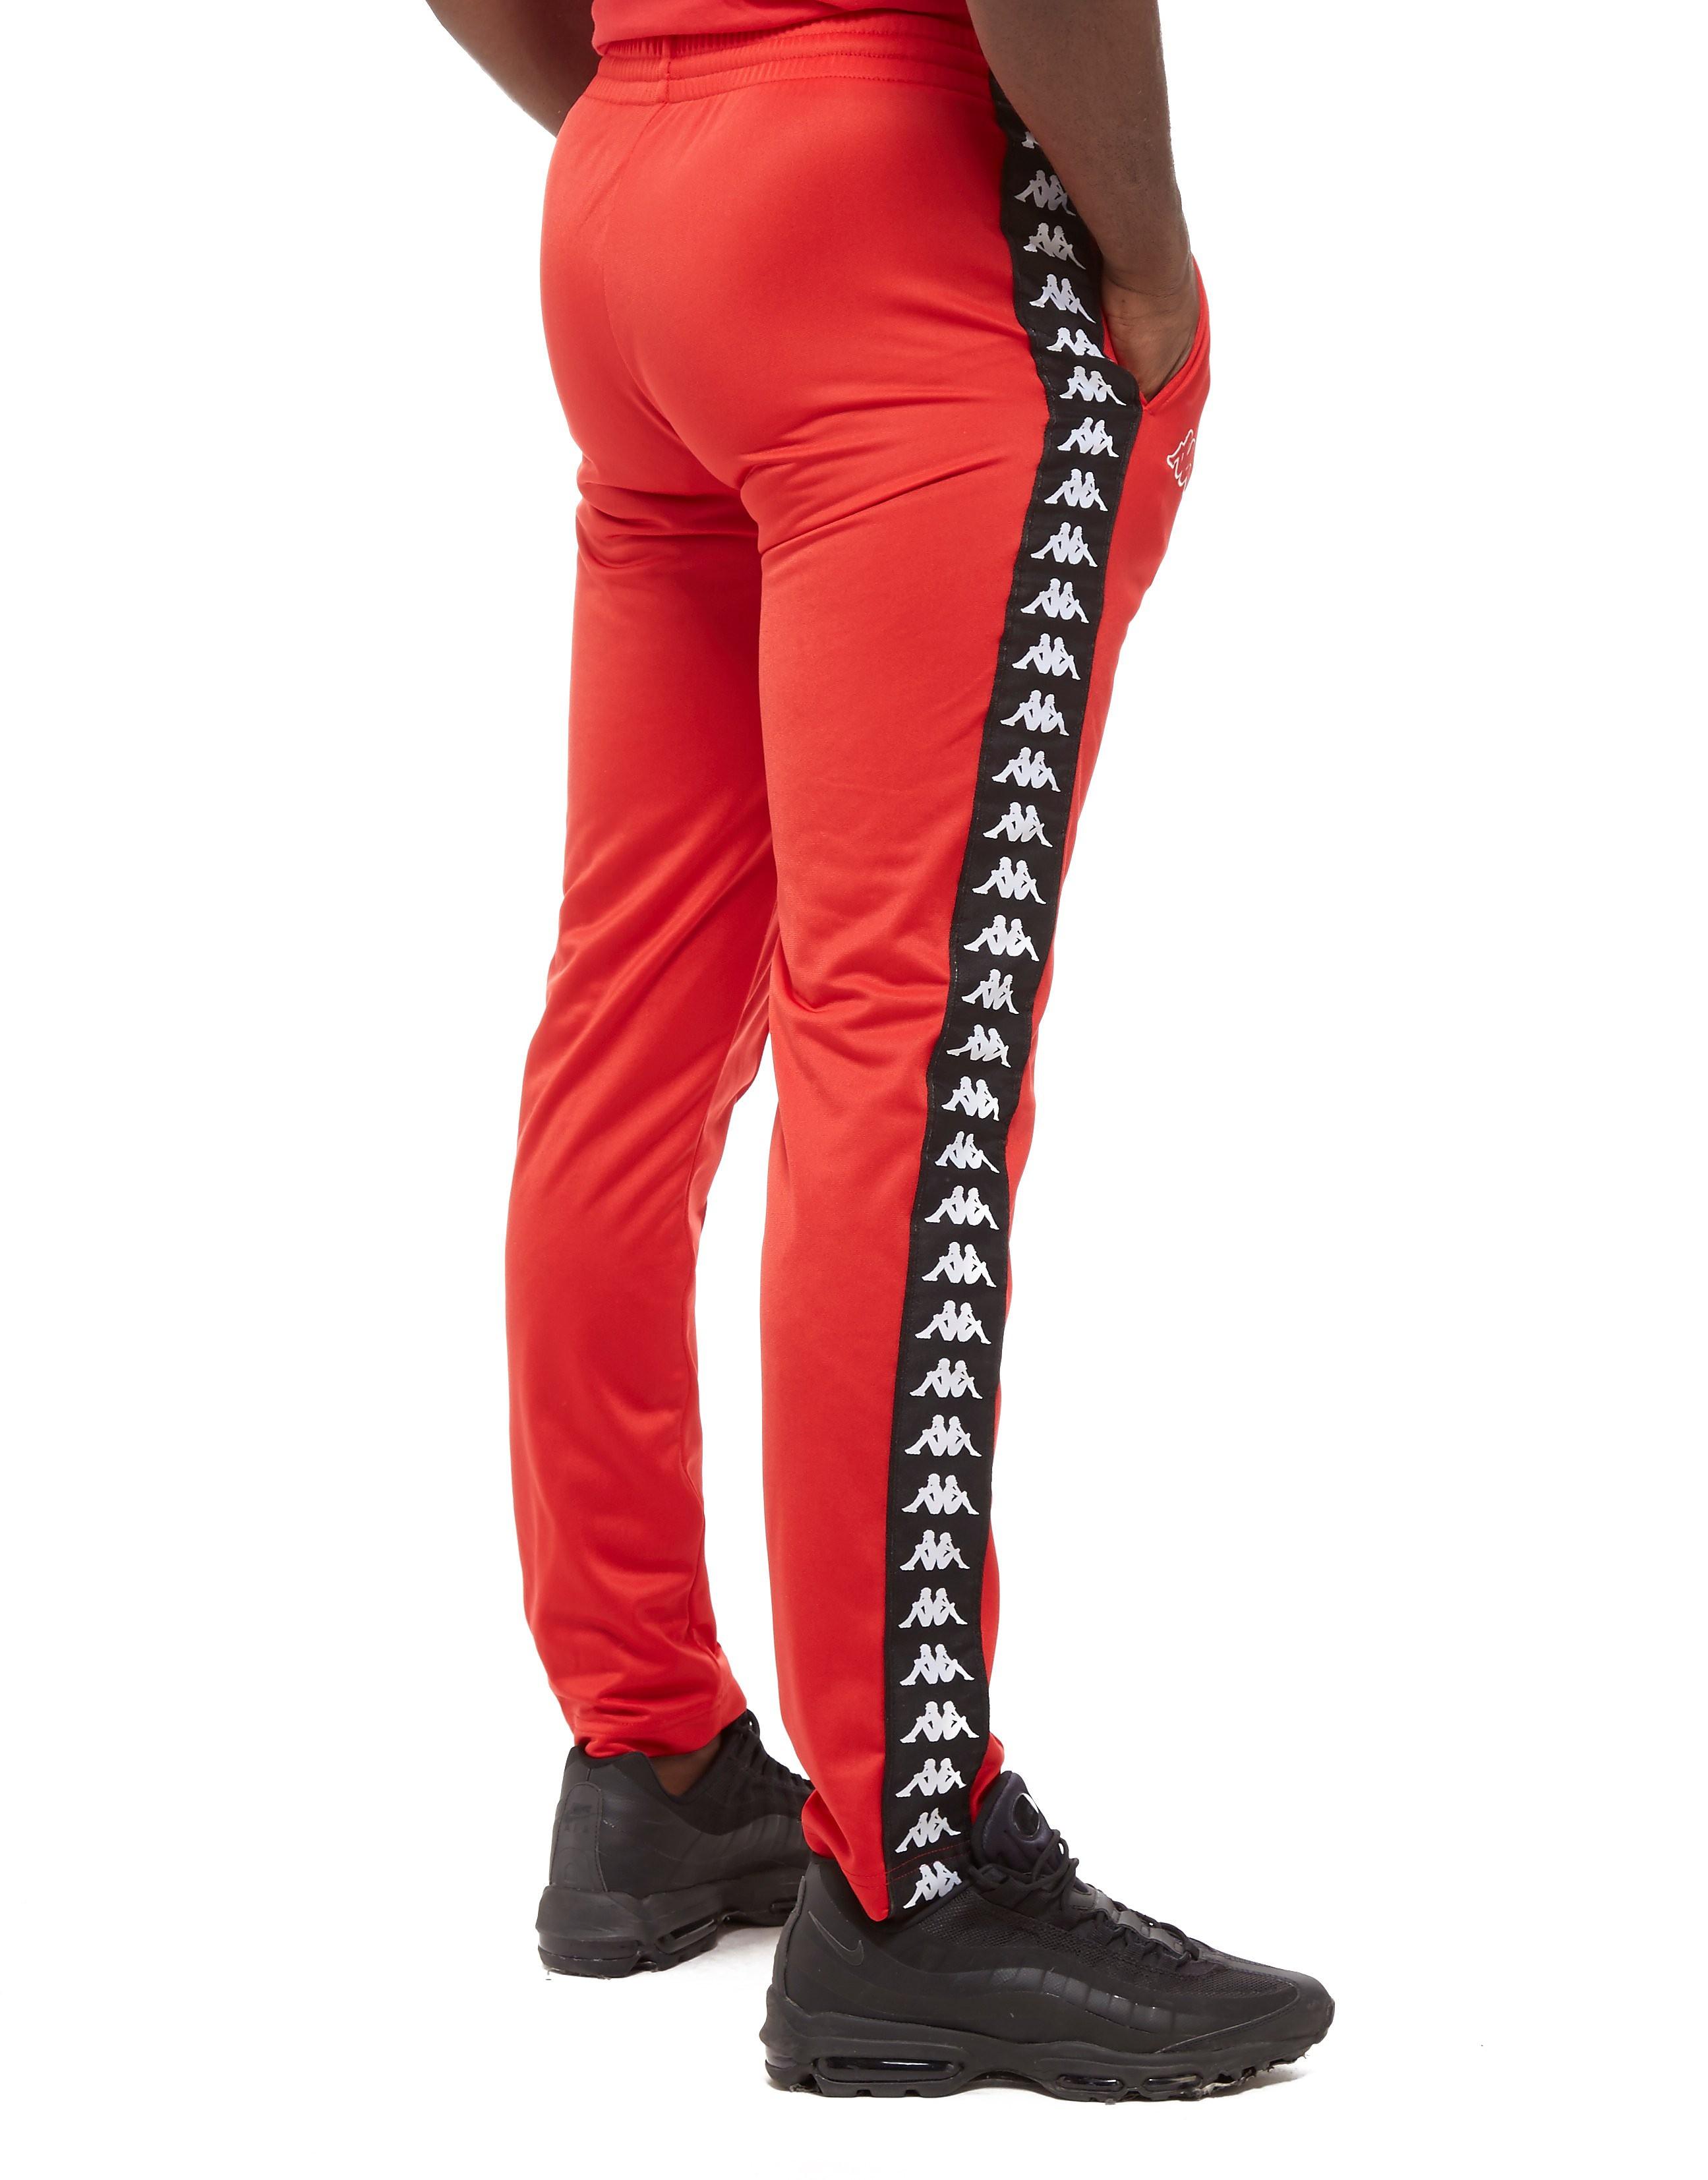 Kappa Astoria Pants